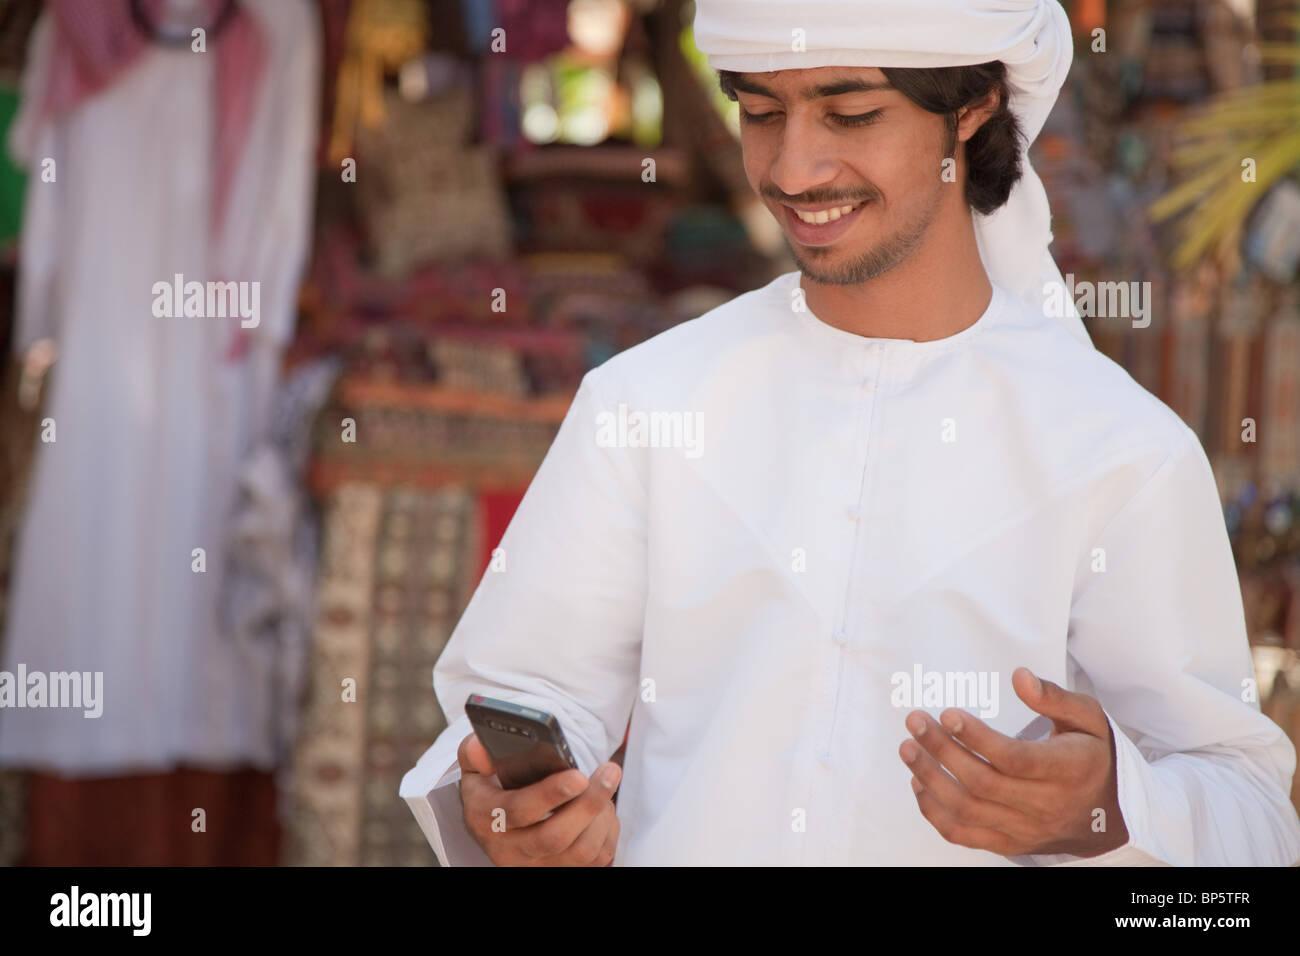 Nahen Ostens Mann Blick auf Handy Stockbild